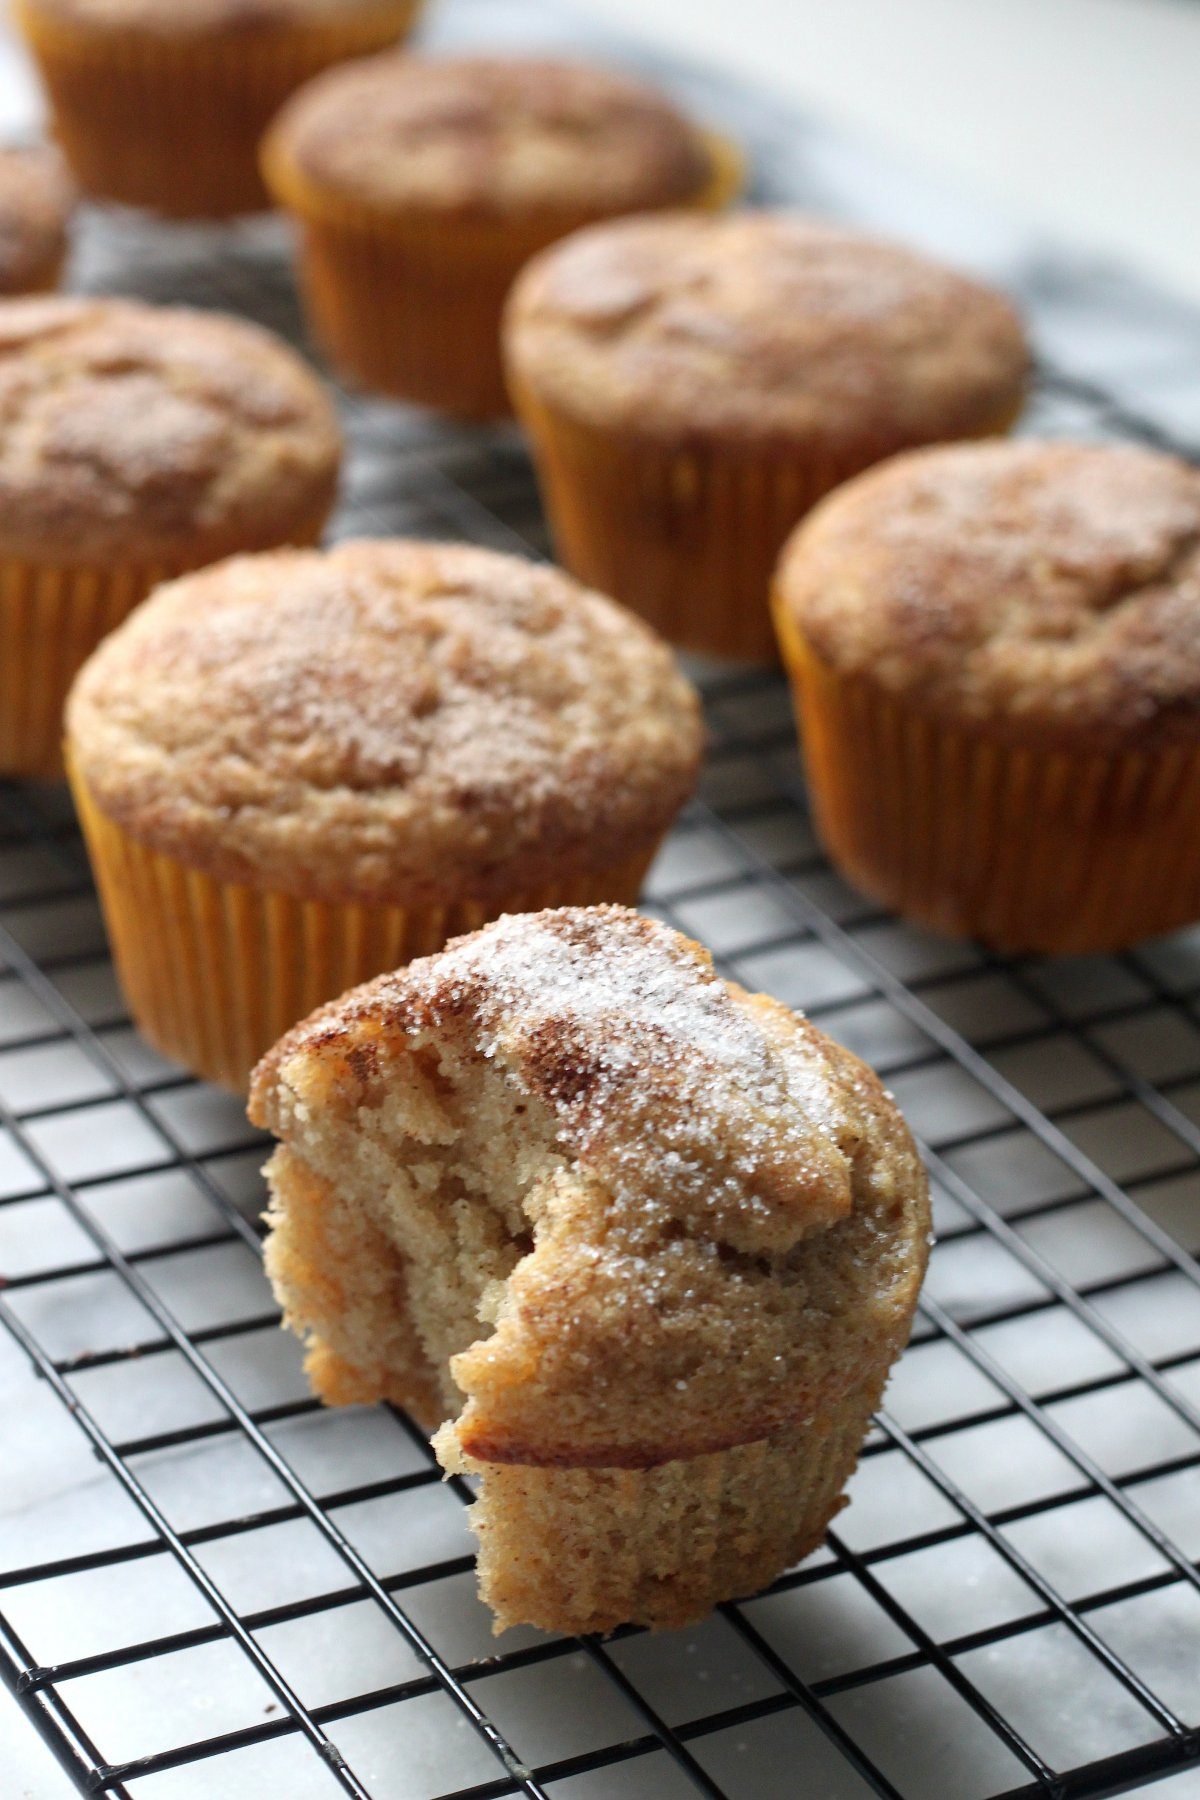 Vegan) Cinnamon Sugar Doughnut Muffins - Baker by Nature